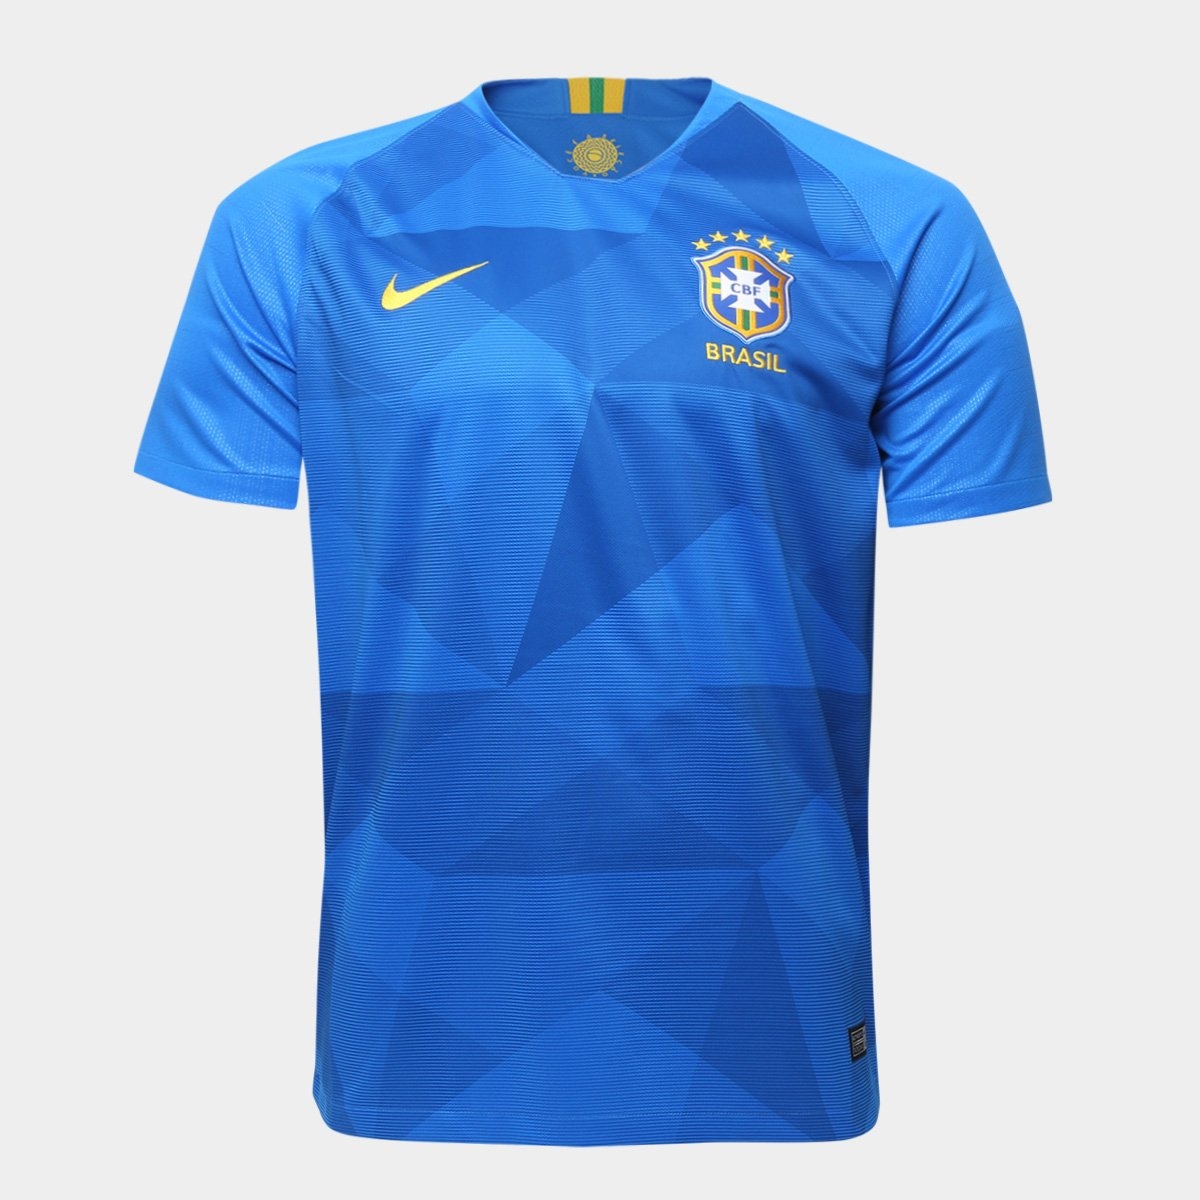 a8765d214c ... Camisa Seleção Brasil II 2018 nº 19 Willian - Torcedor Nike Masculina  ...